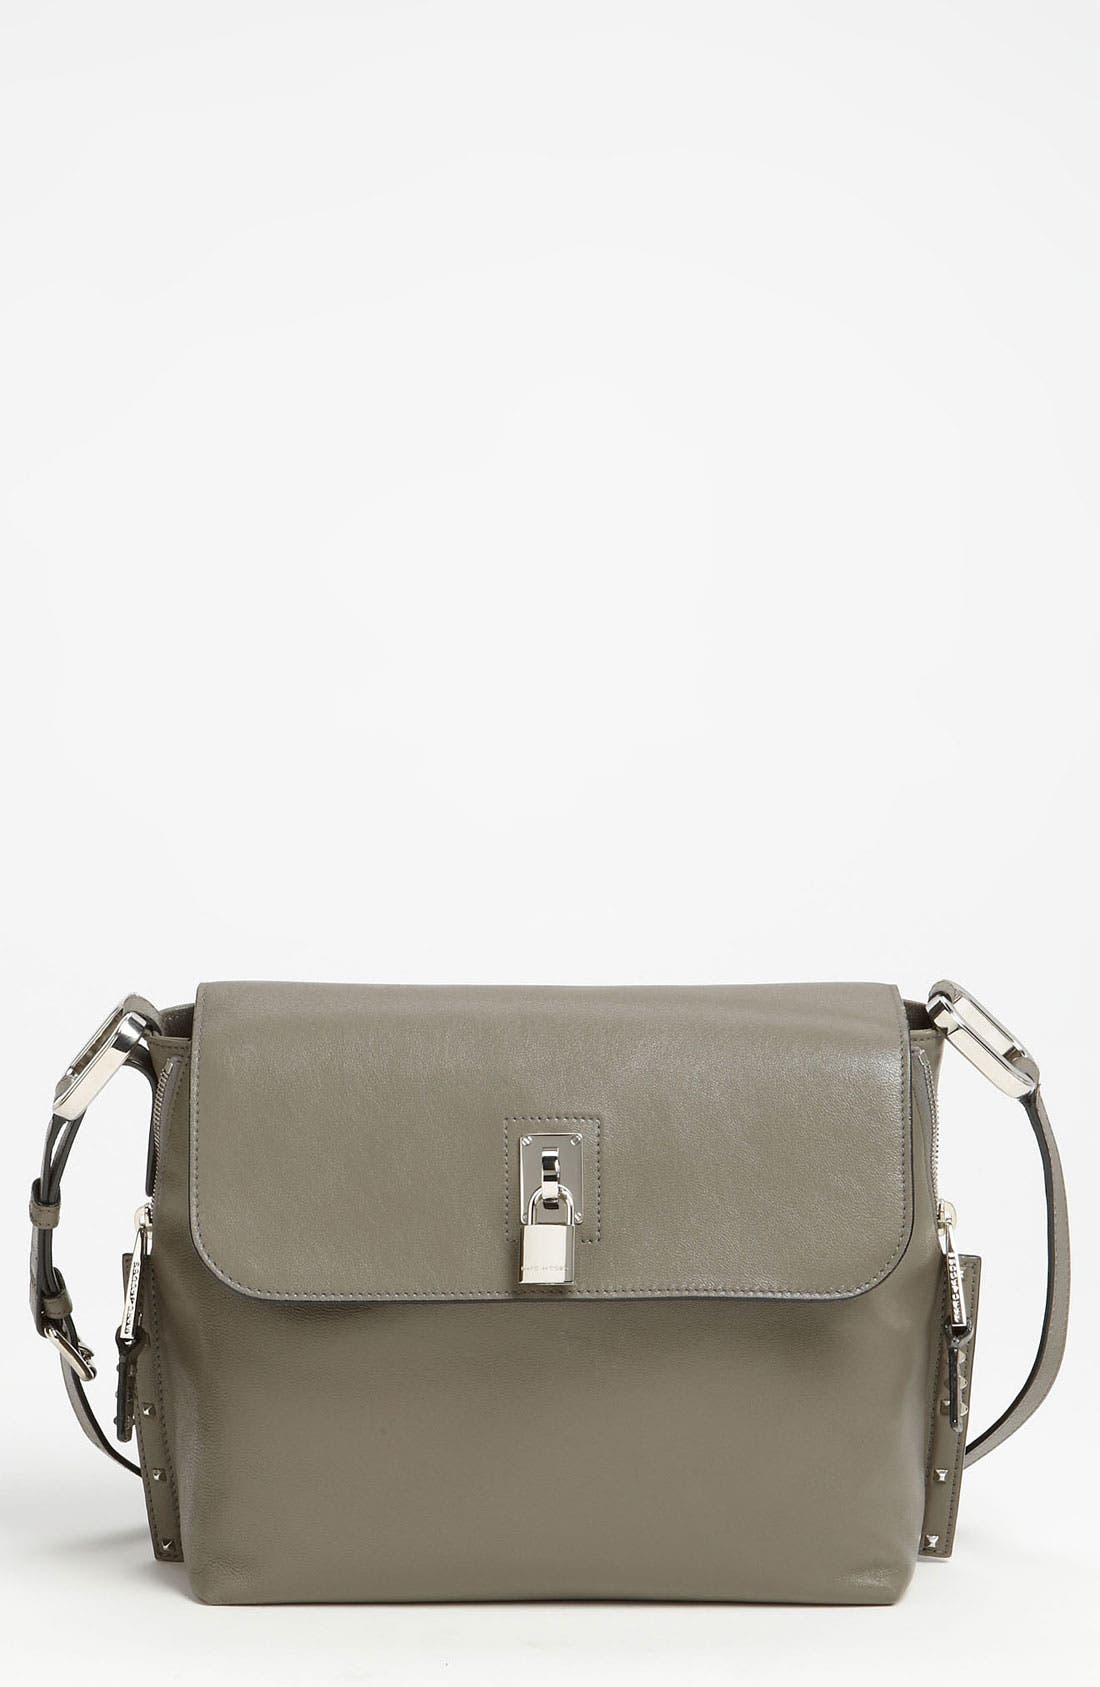 Main Image - MARC JACOBS 'Paradise Baxter' Lambskin Leather Crossbody Bag